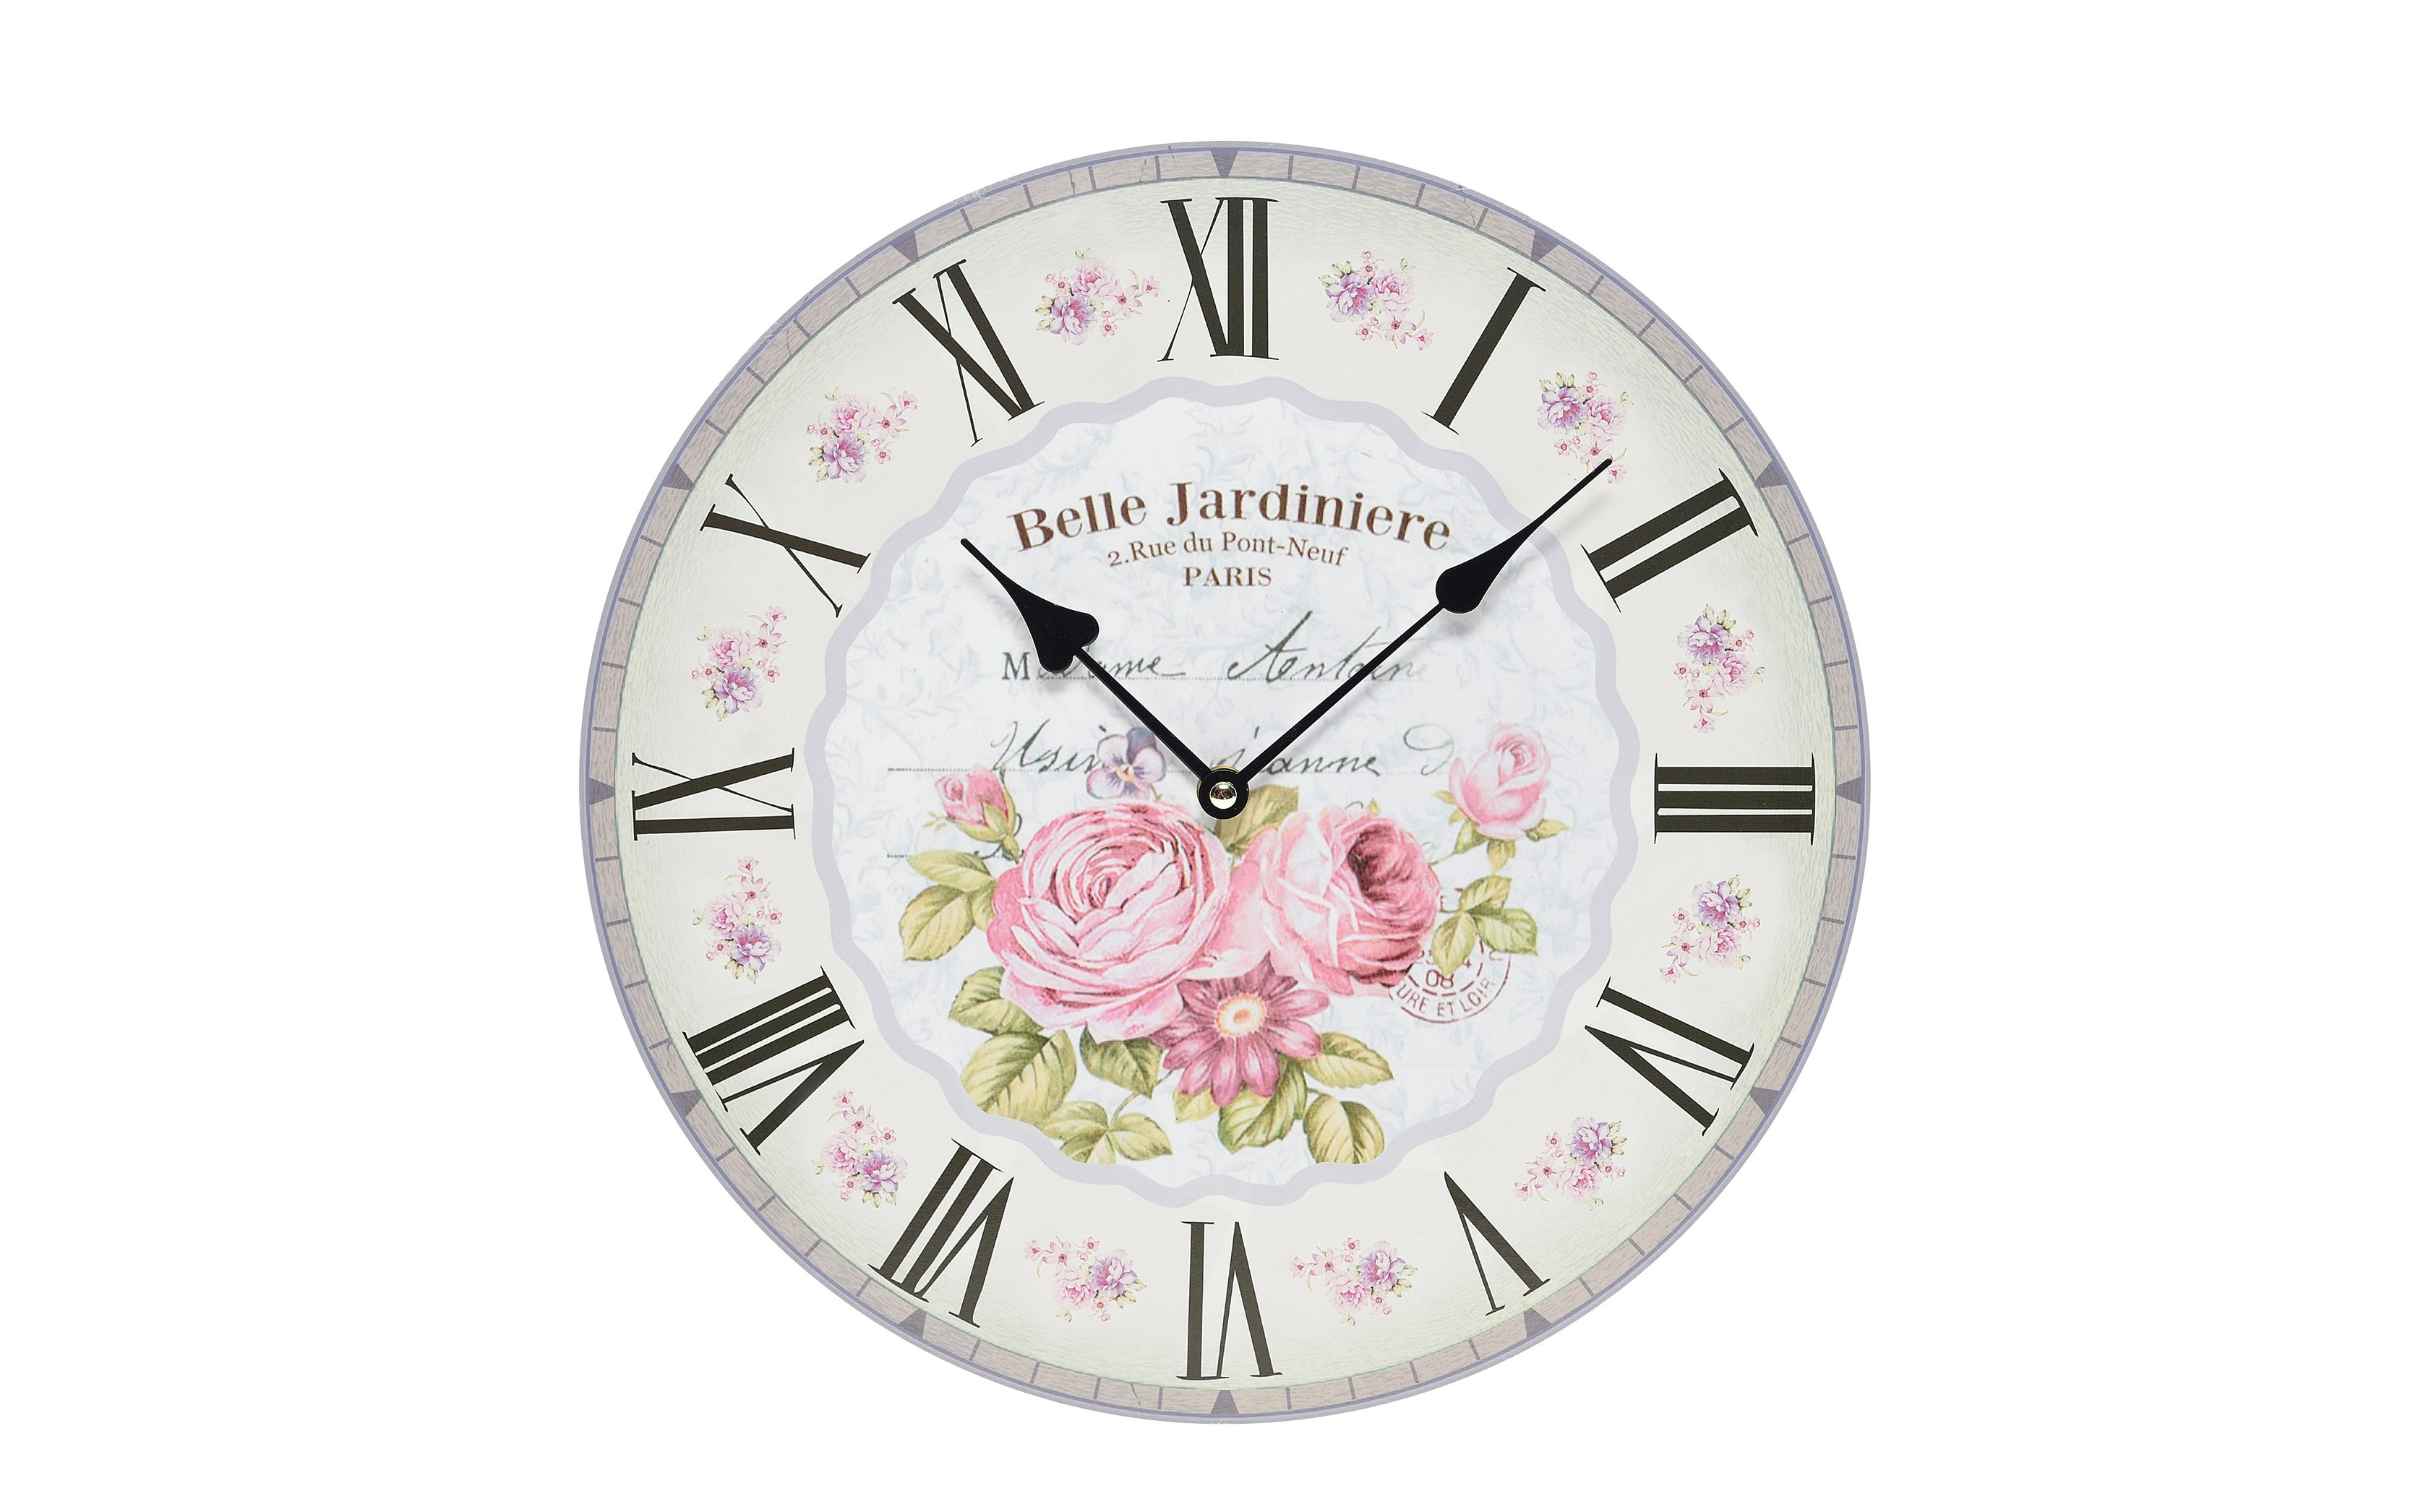 Часы настенные Ia?rosНастенные часы<br>Кварцевый механизм.<br><br>Material: МДФ<br>Ширина см: 34<br>Высота см: 34<br>Глубина см: 4